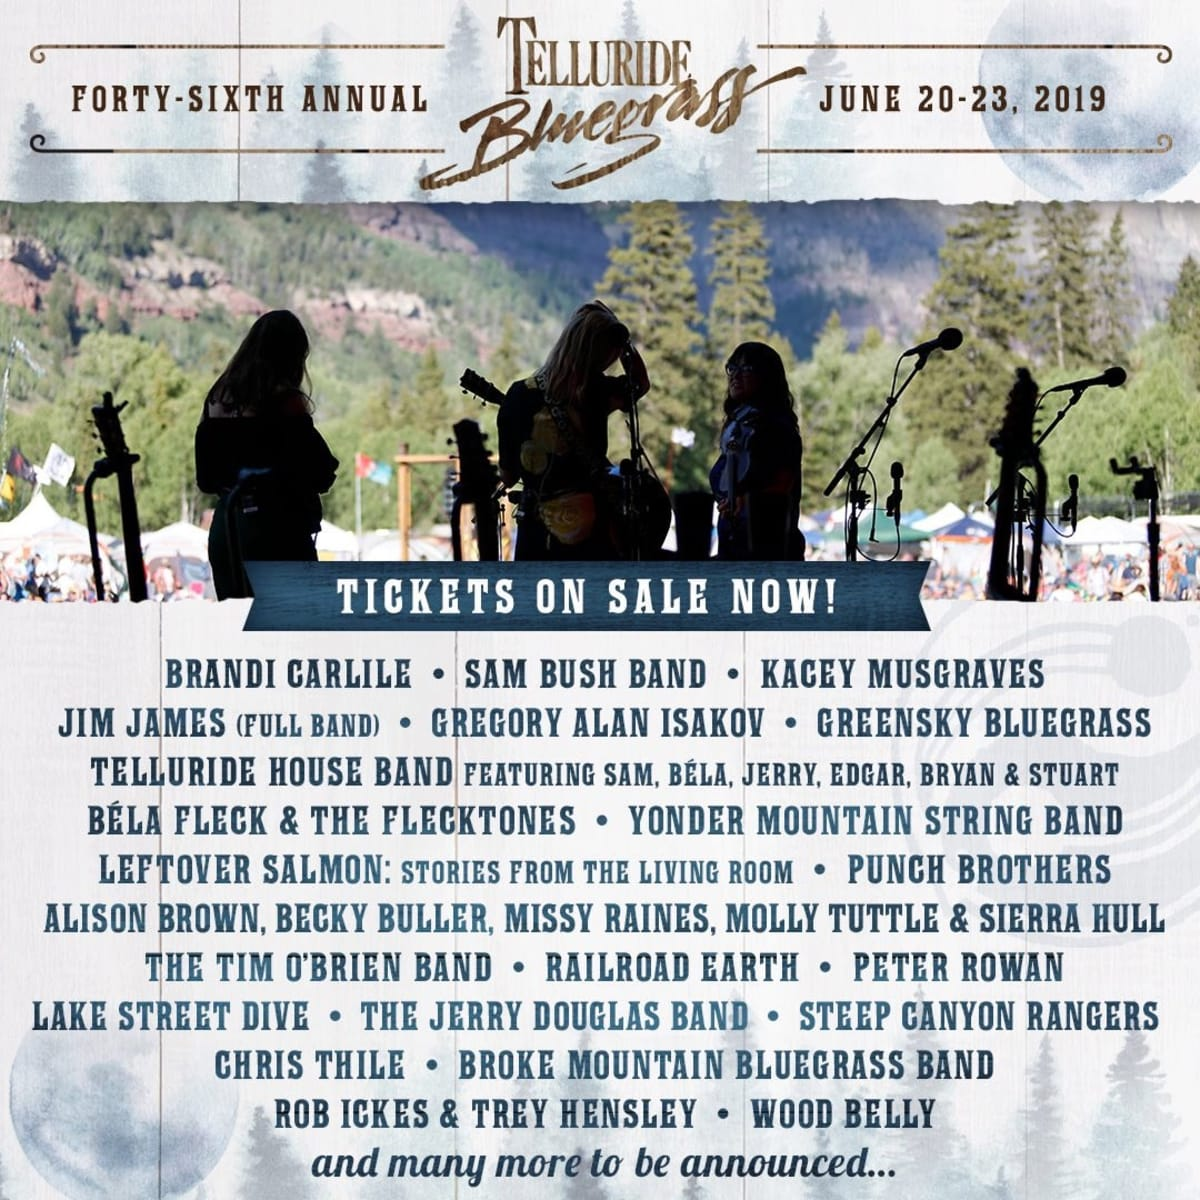 Telluride Bluegrass Festival 2020.Telluride Bluegrass Festival Confirms Preliminary 2019 Lineup